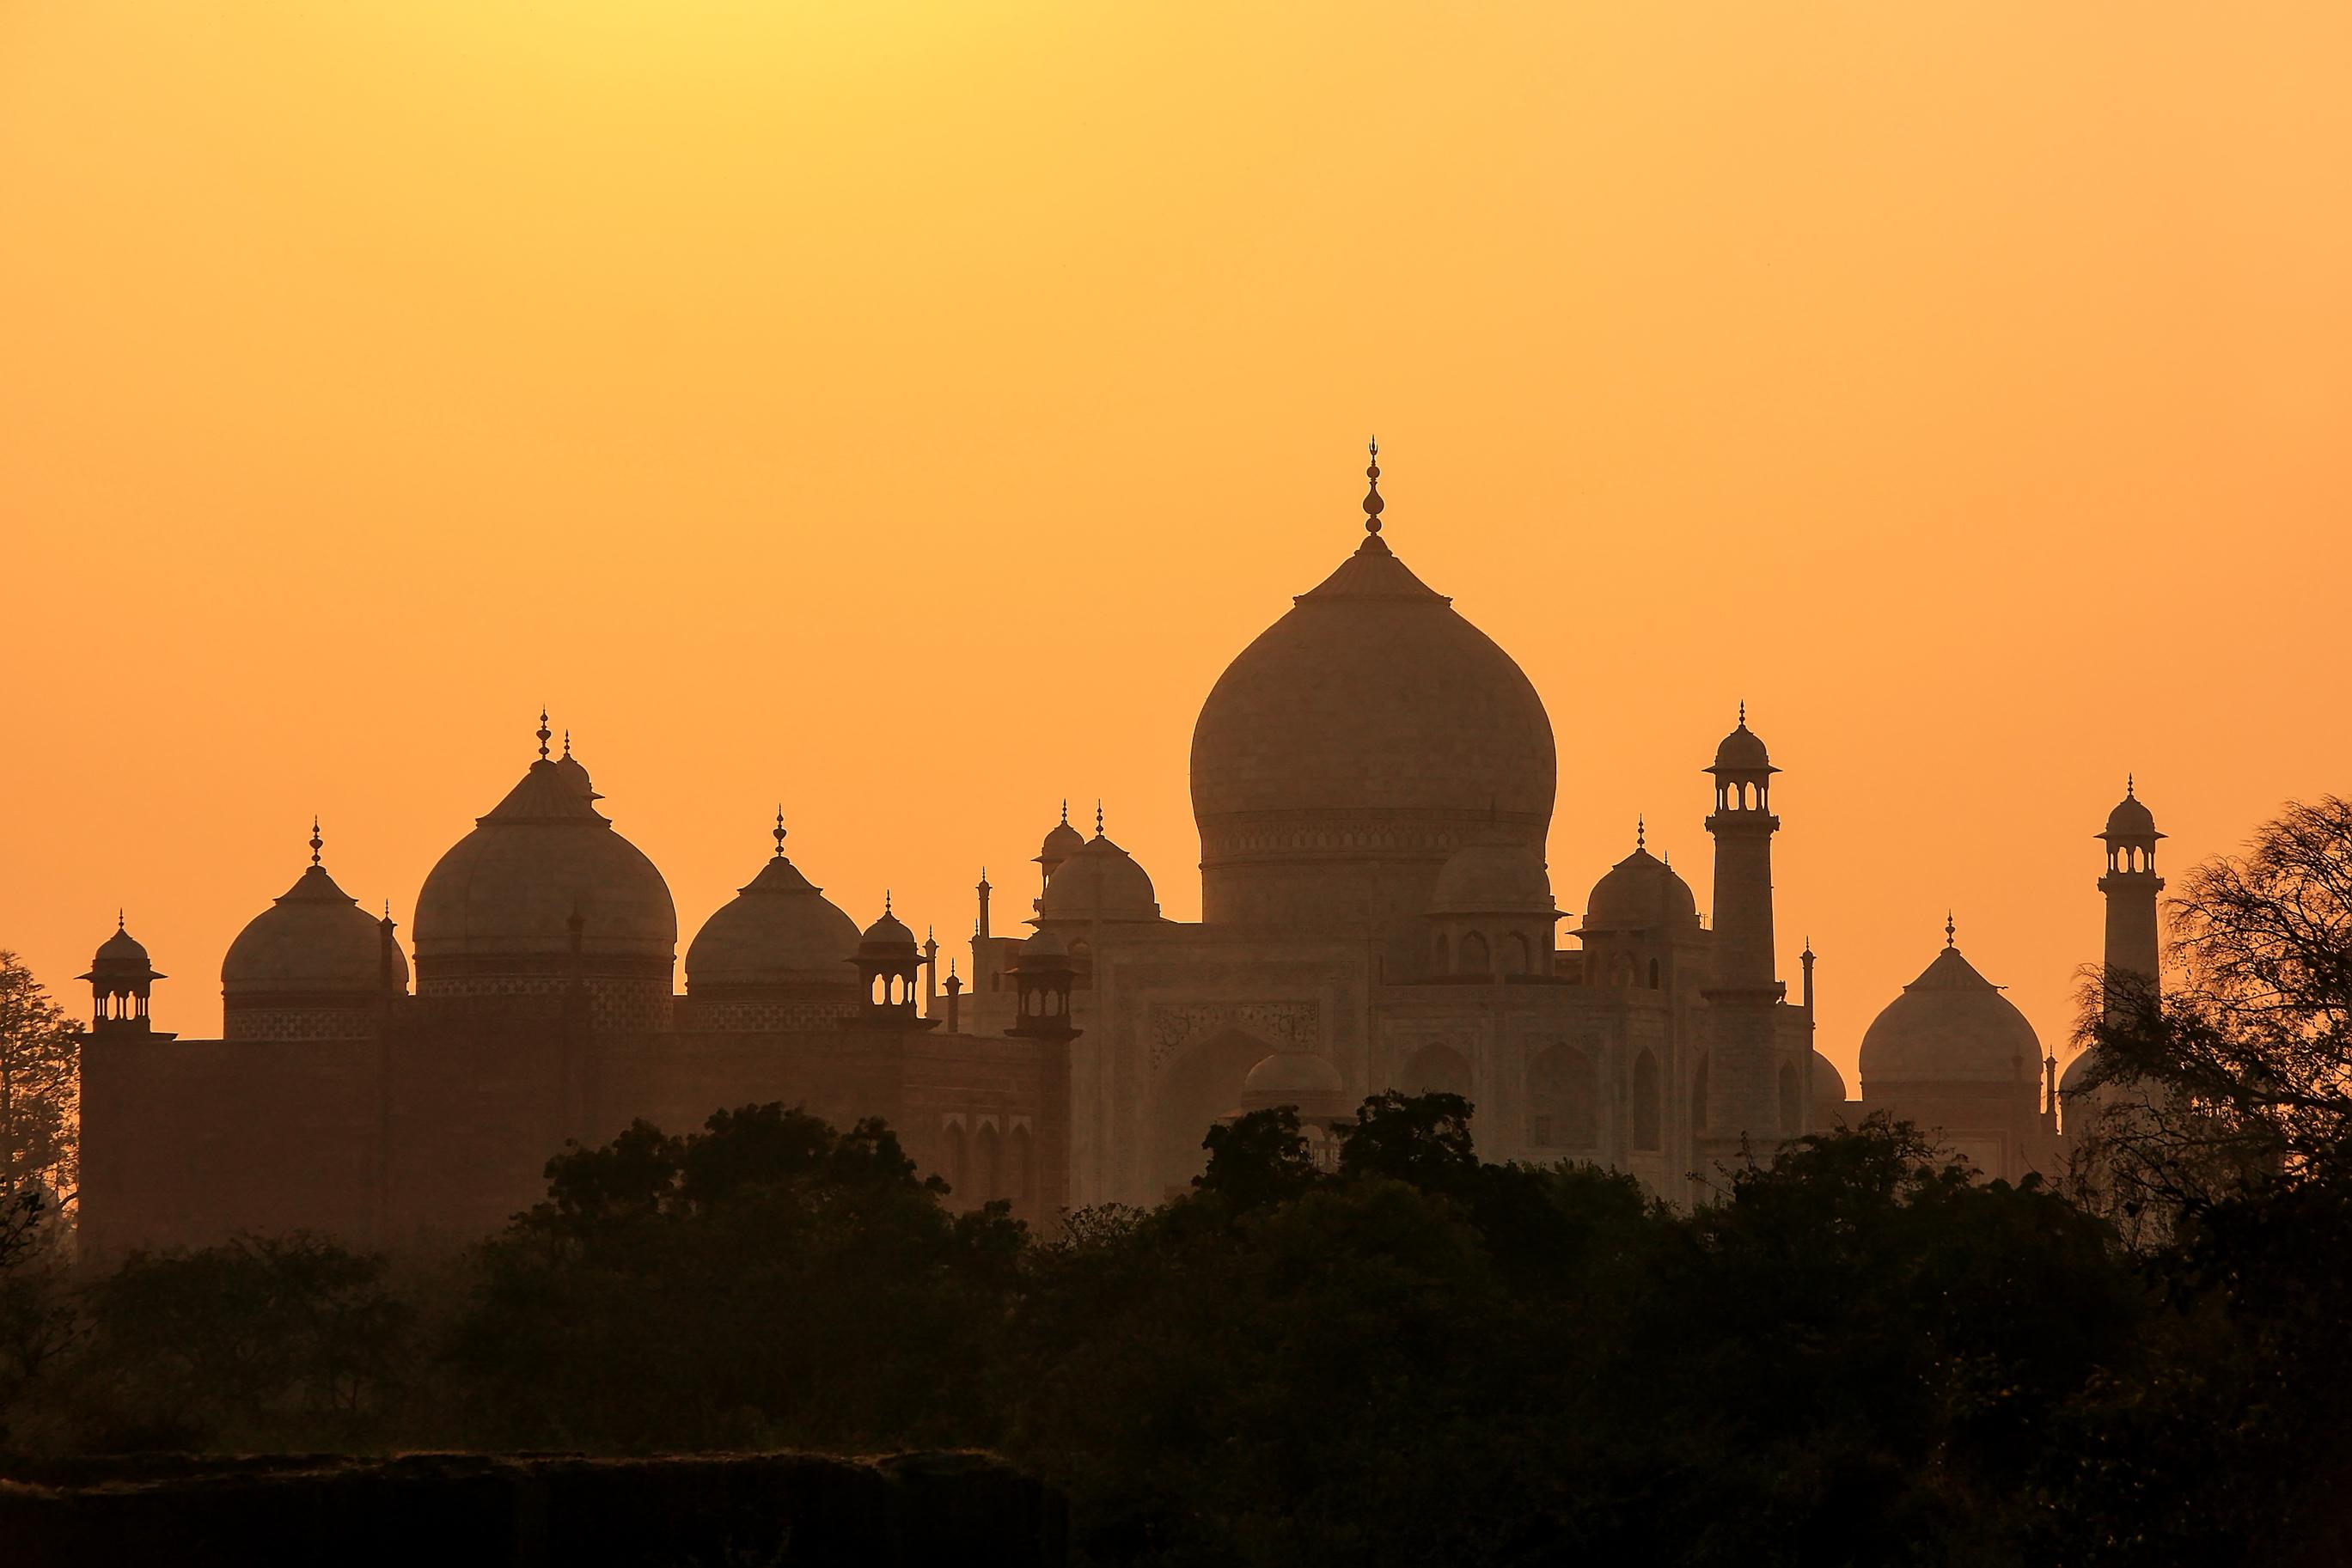 The Taj Mahal bathed in sunset